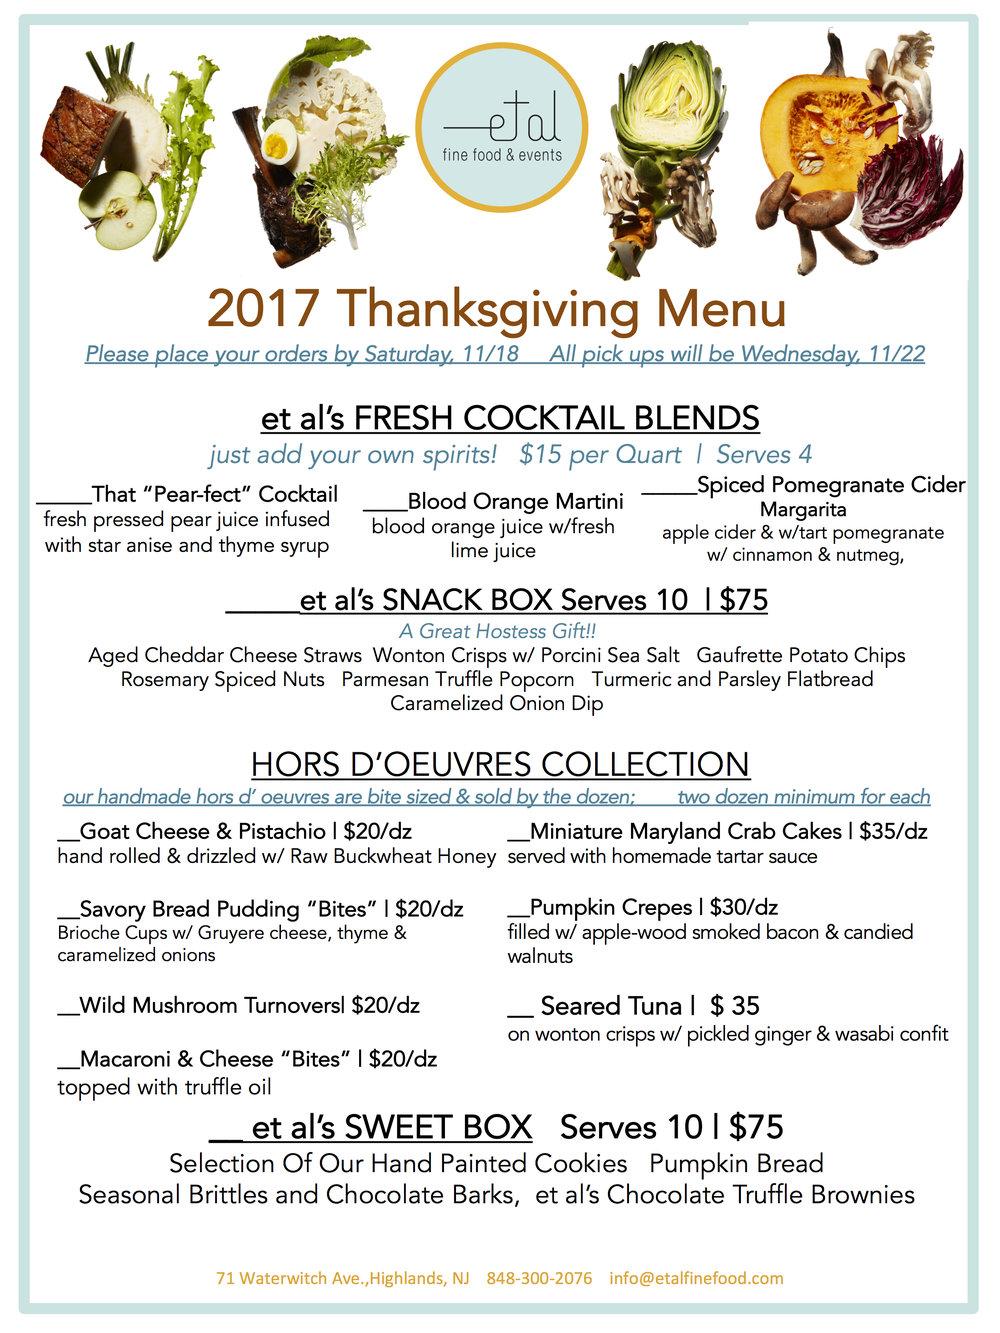 Thanksgiving Menu 2017 A.jpg